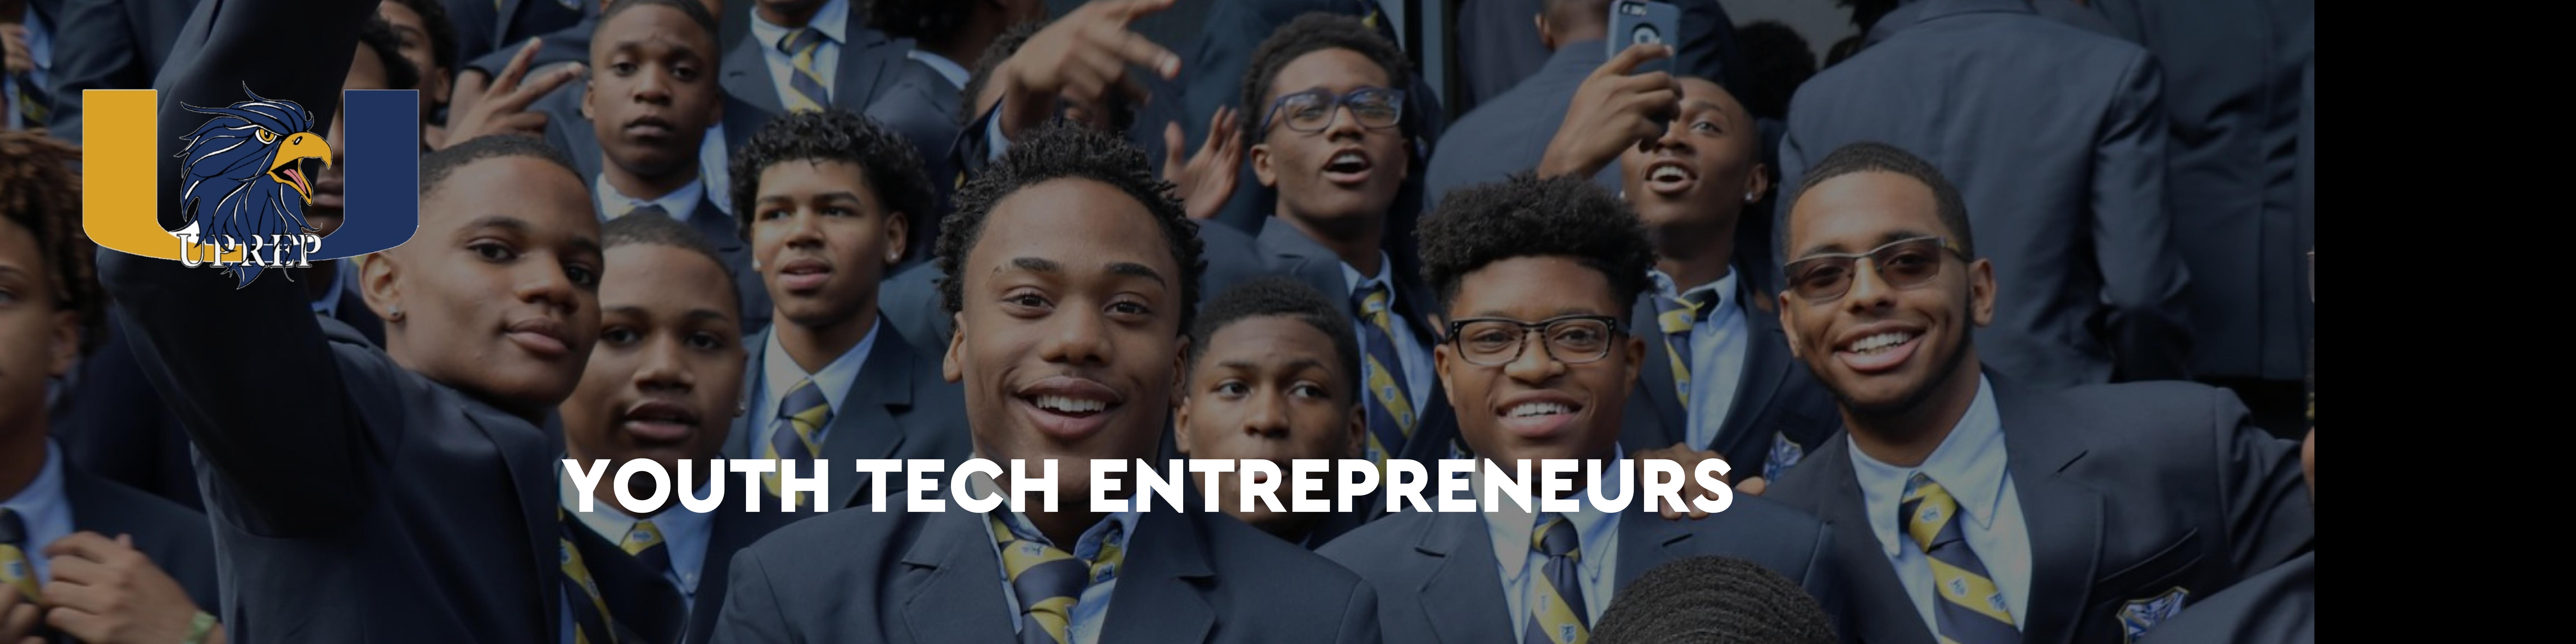 Technology School for Black Boys